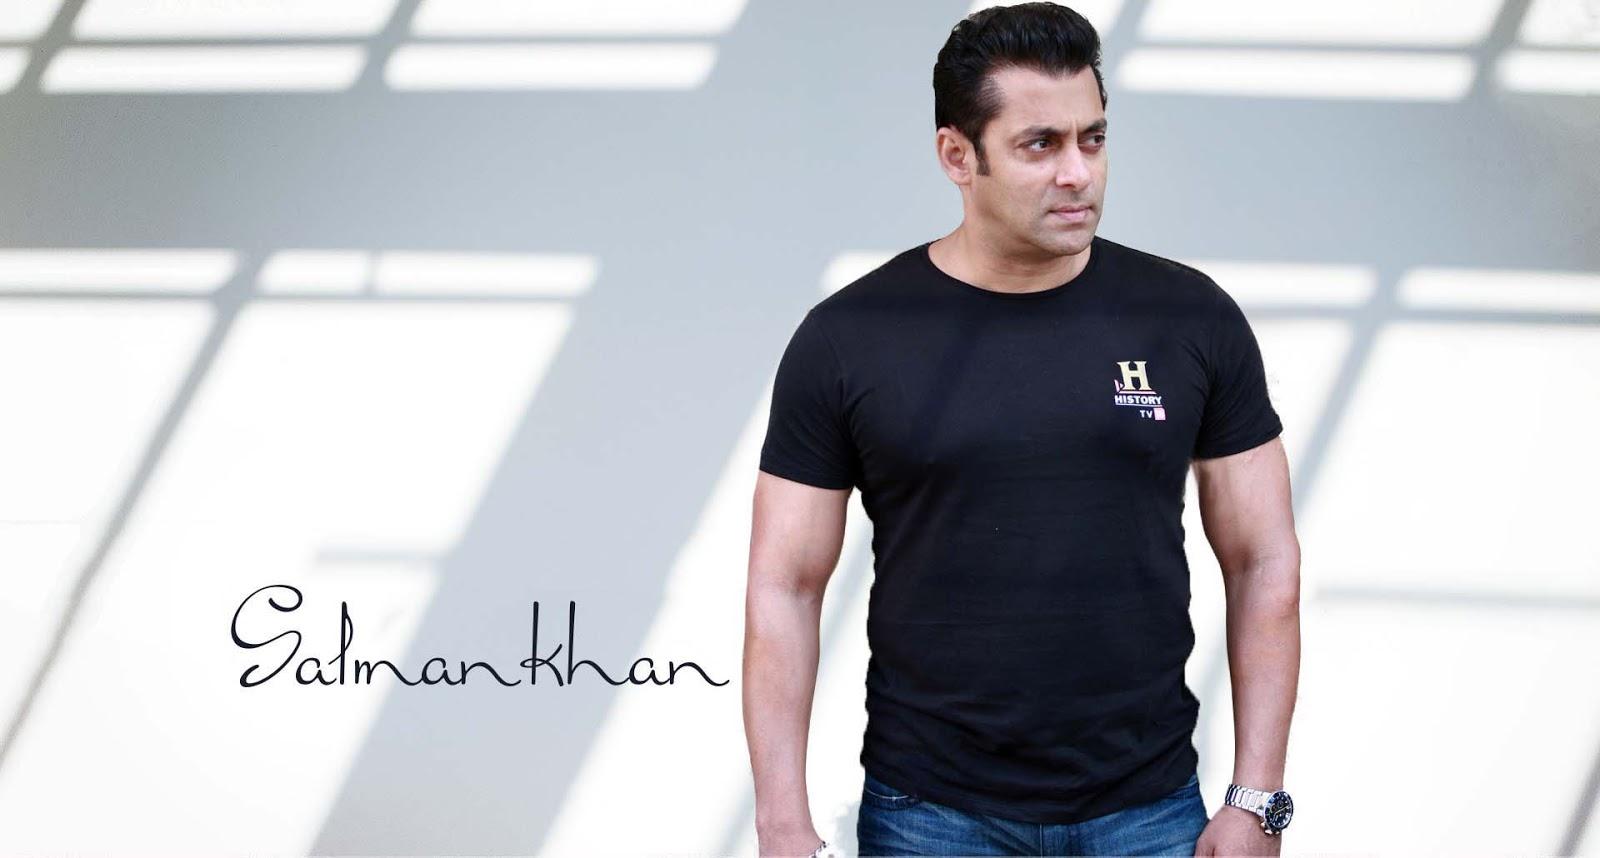 Salman Khan Hd Wallpaper Indian Kings Latest Photos Free Images